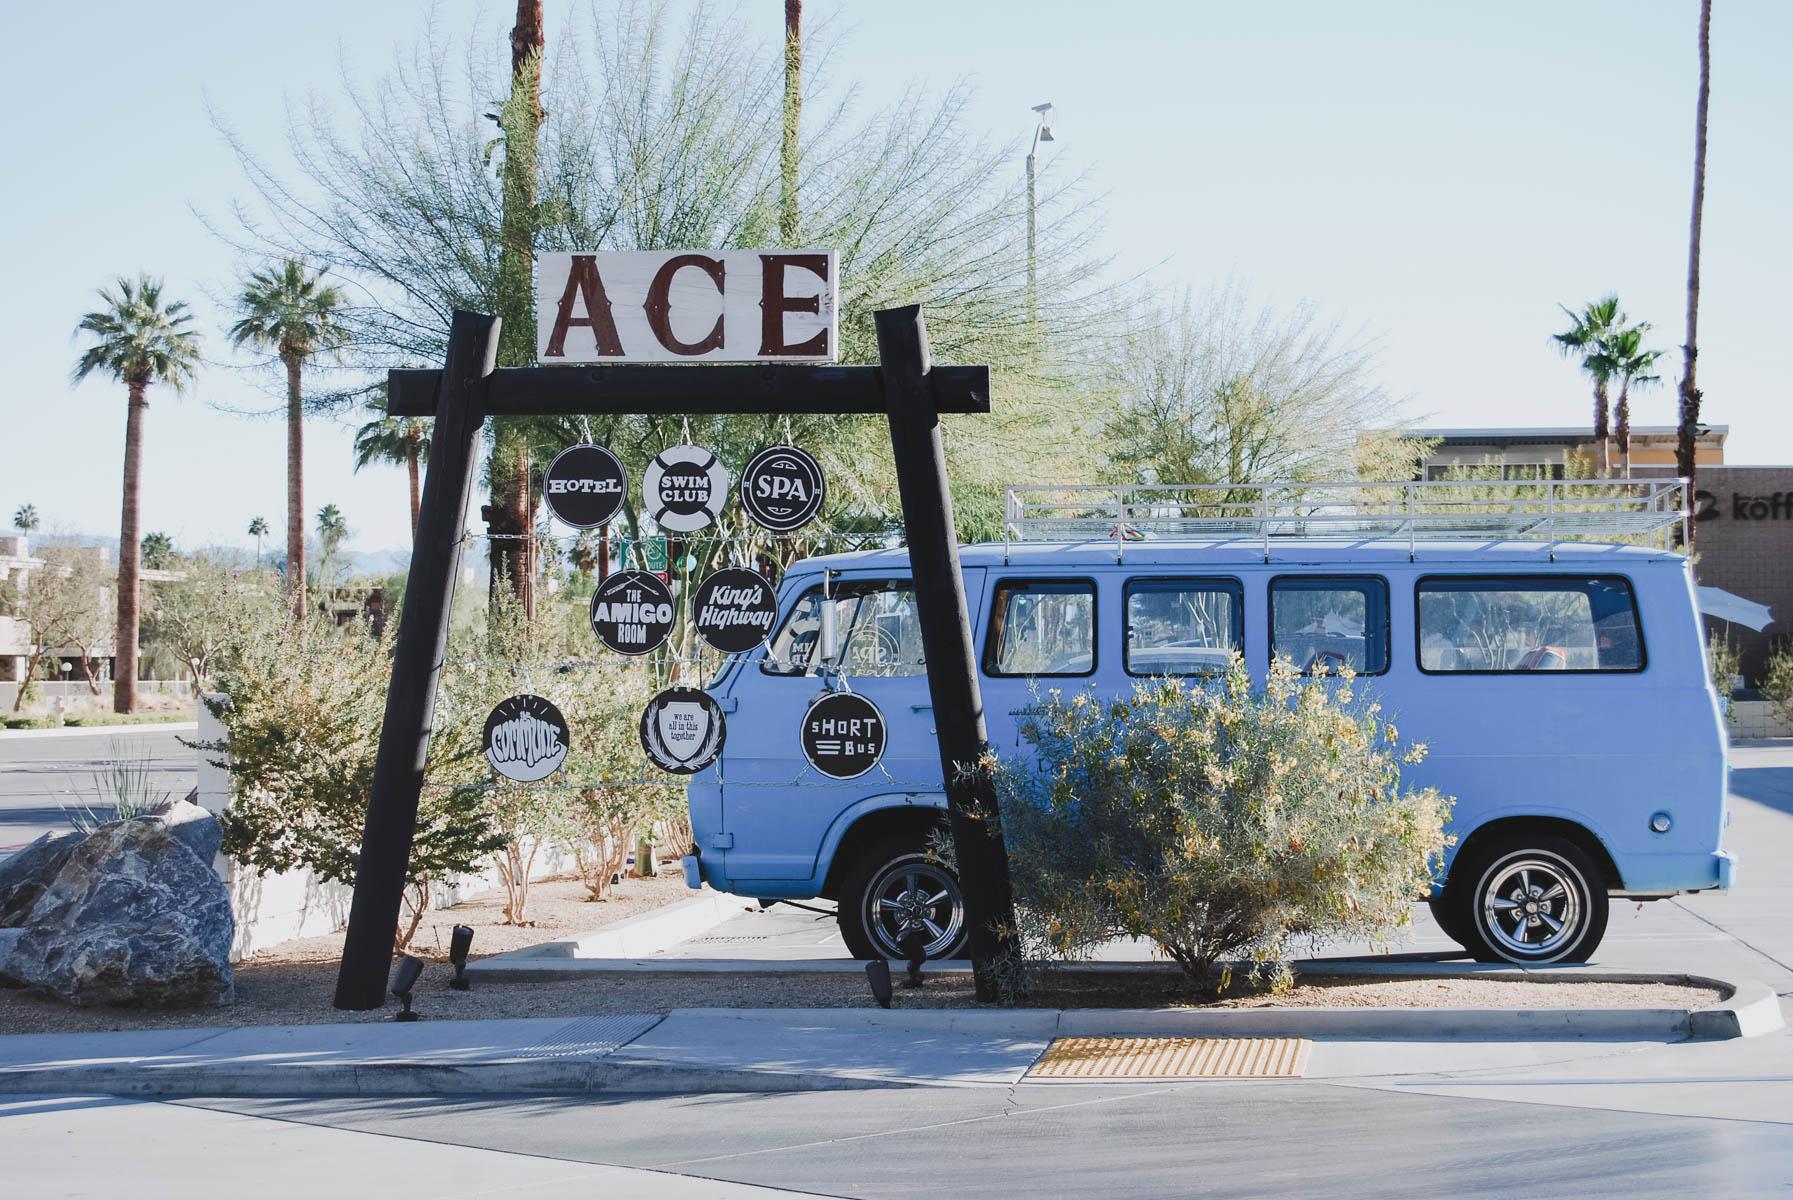 Rentnerstadt oder Hipsterhochburg? Palm Springs ist cool! CW-Bus vor dem ACE Hotel